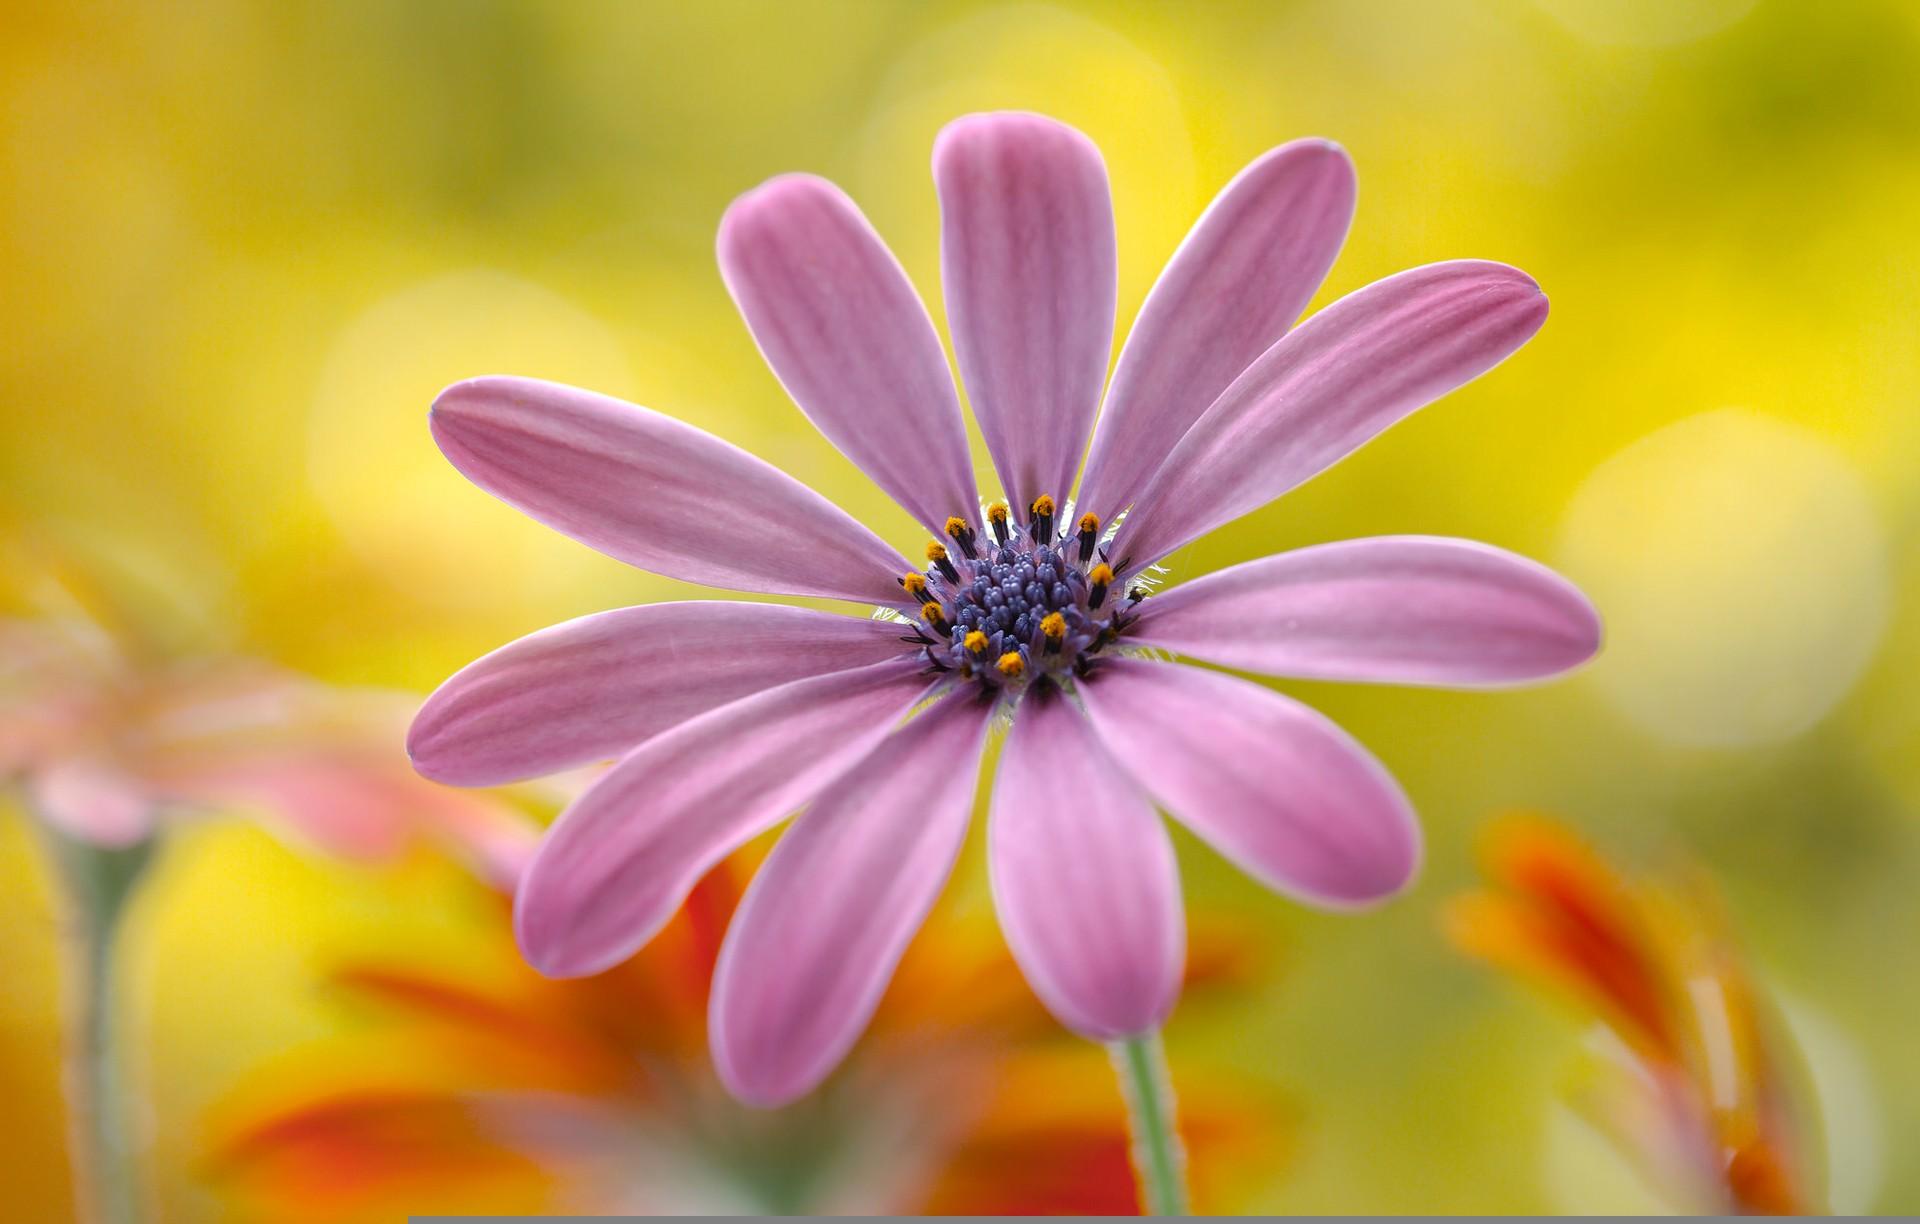 hinh anh hoa cuc dep 53